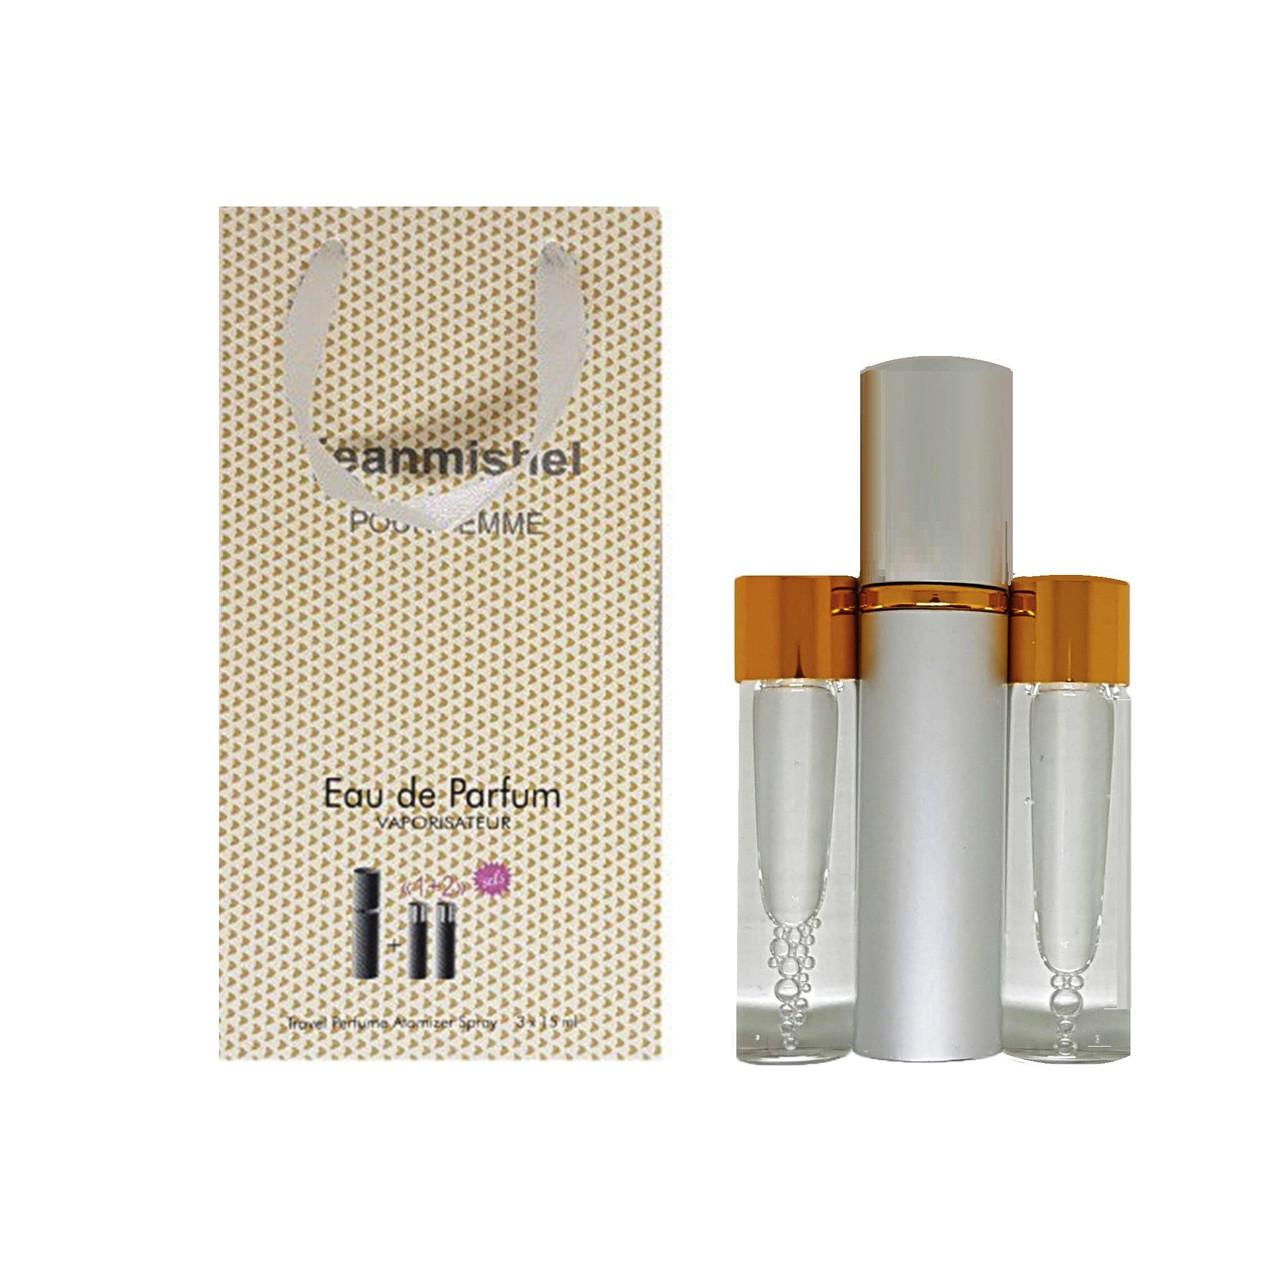 Jeanmishel Pour Femme (53) 3 x 15 ml